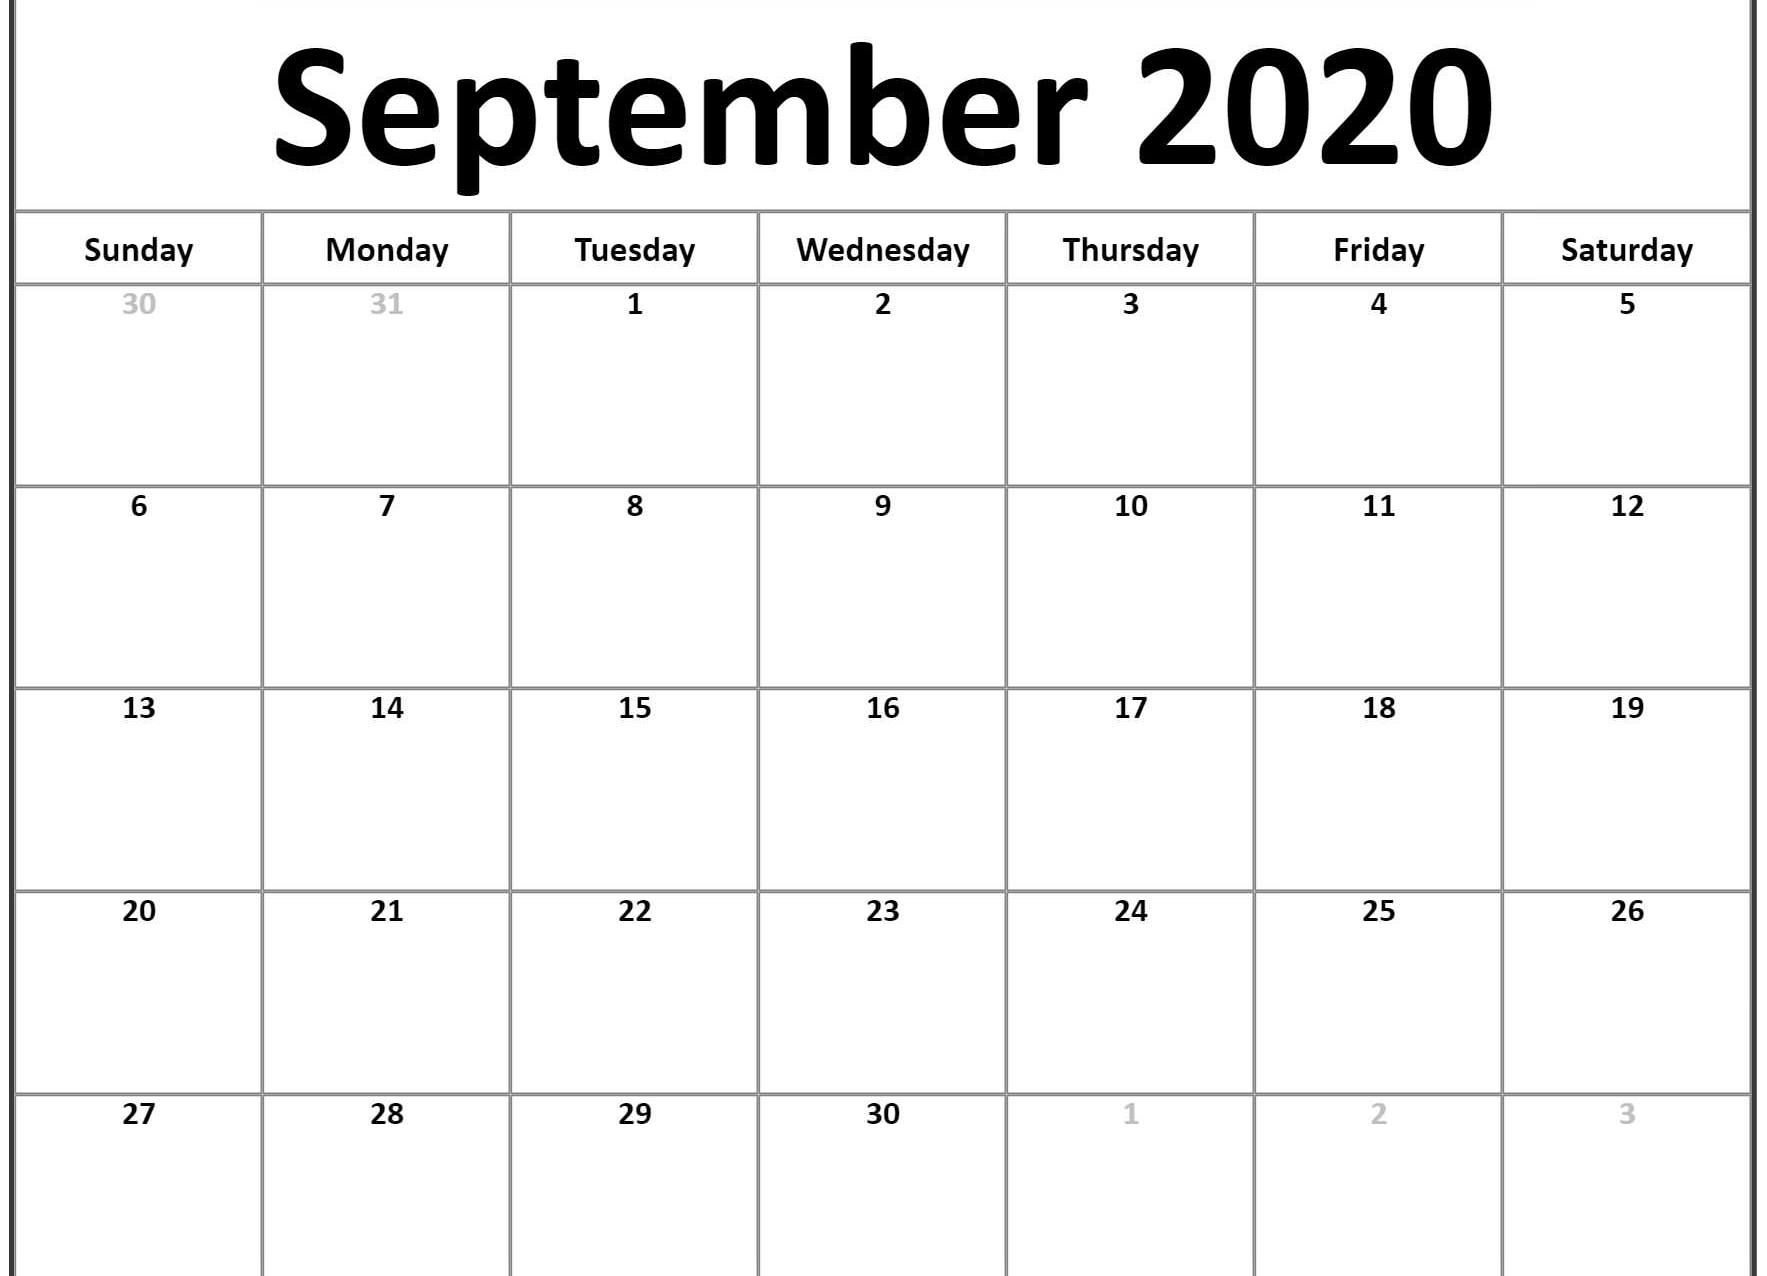 September 2020 Calendar Template | Calendar Word, Calendar for Calender August And September 2020